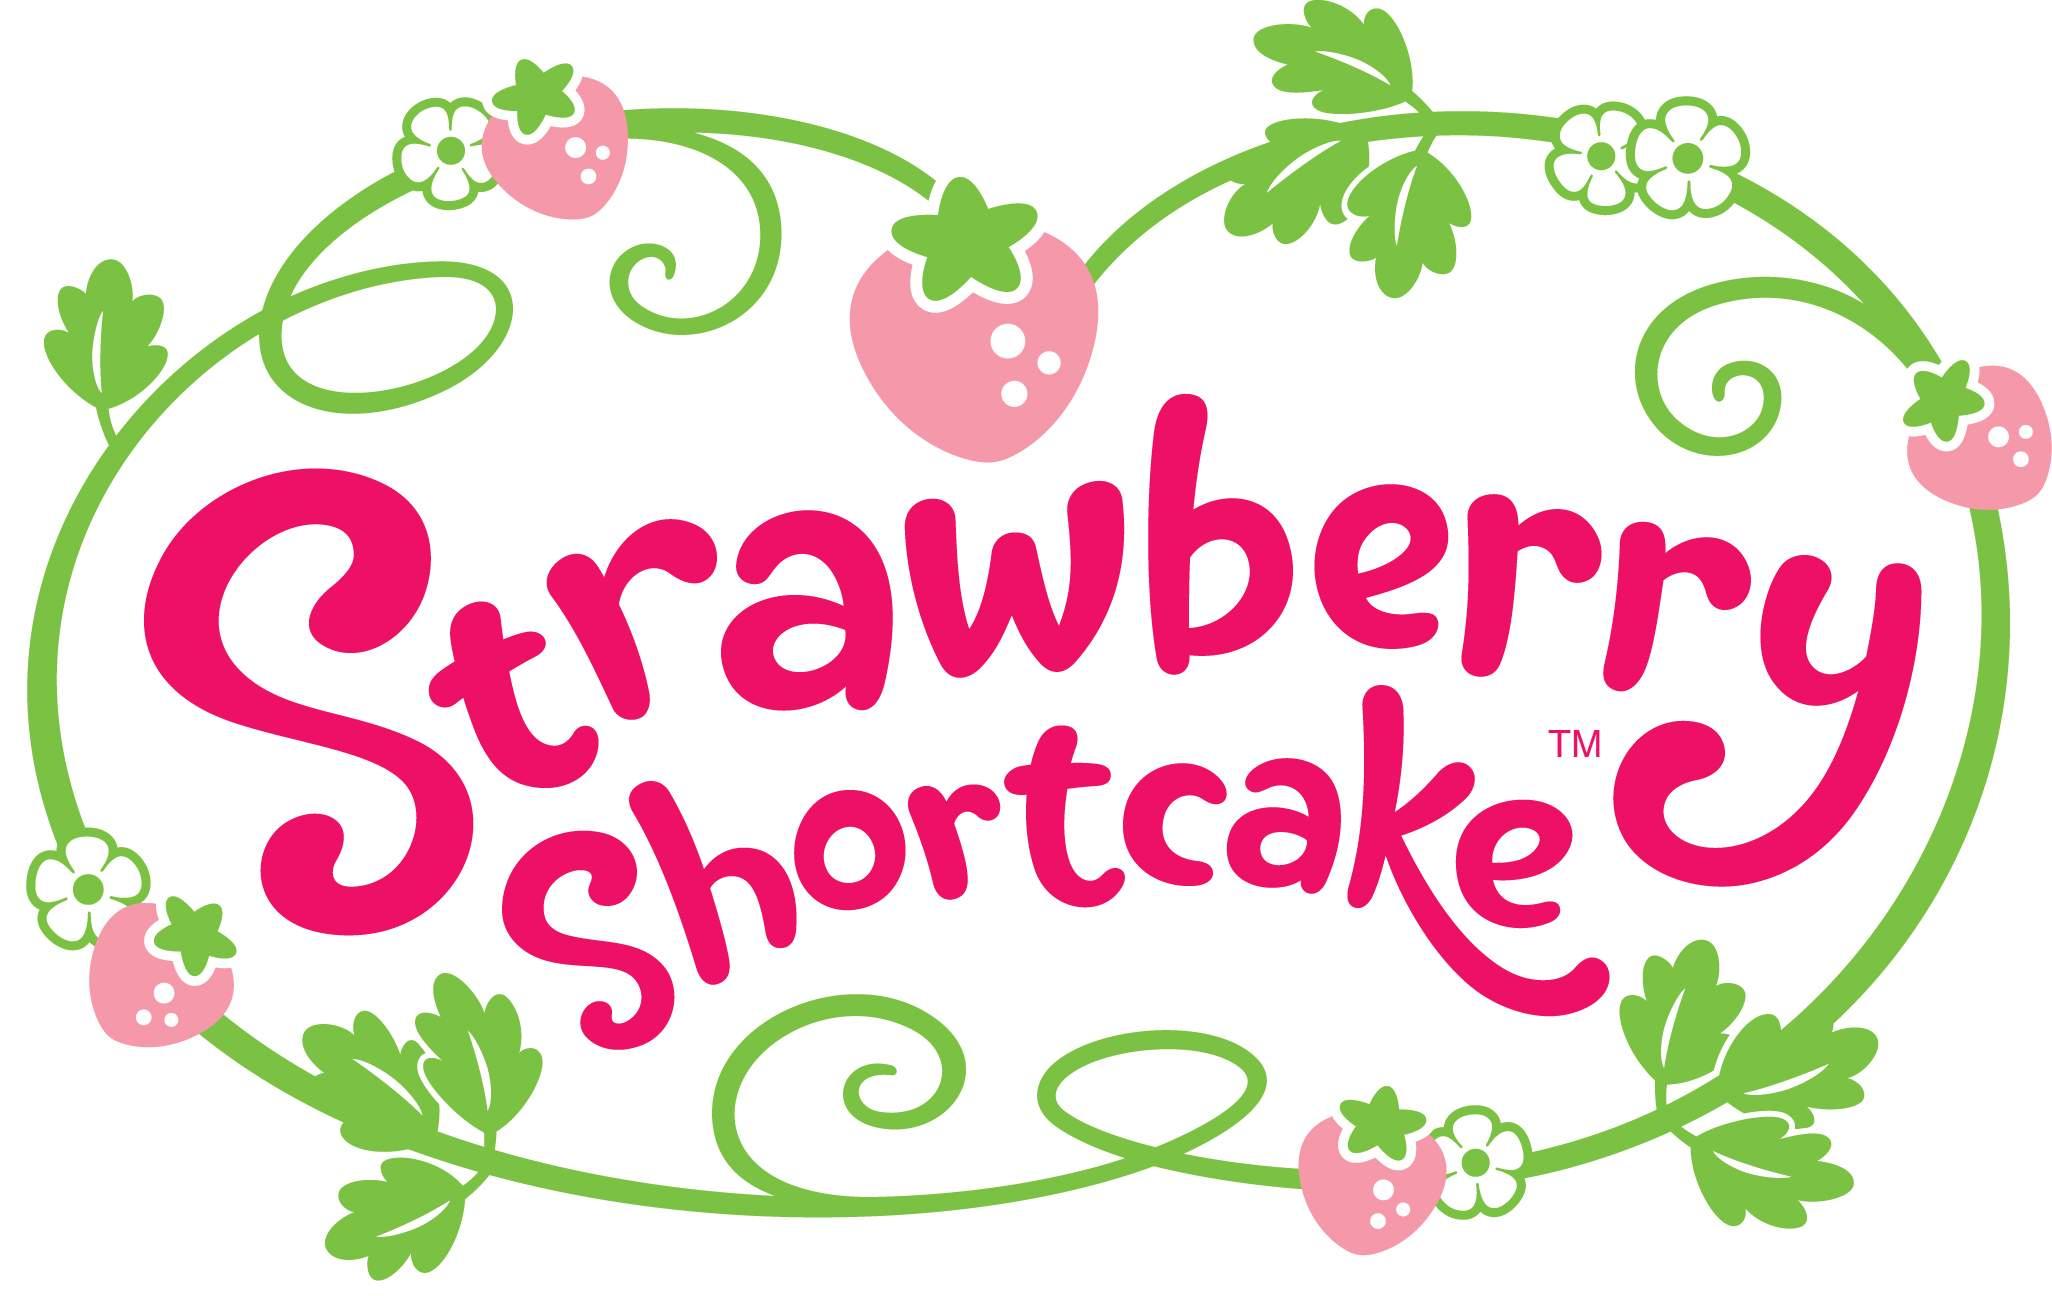 Strawberry Shortcake 1St Birthday Invitations with great invitation ideas